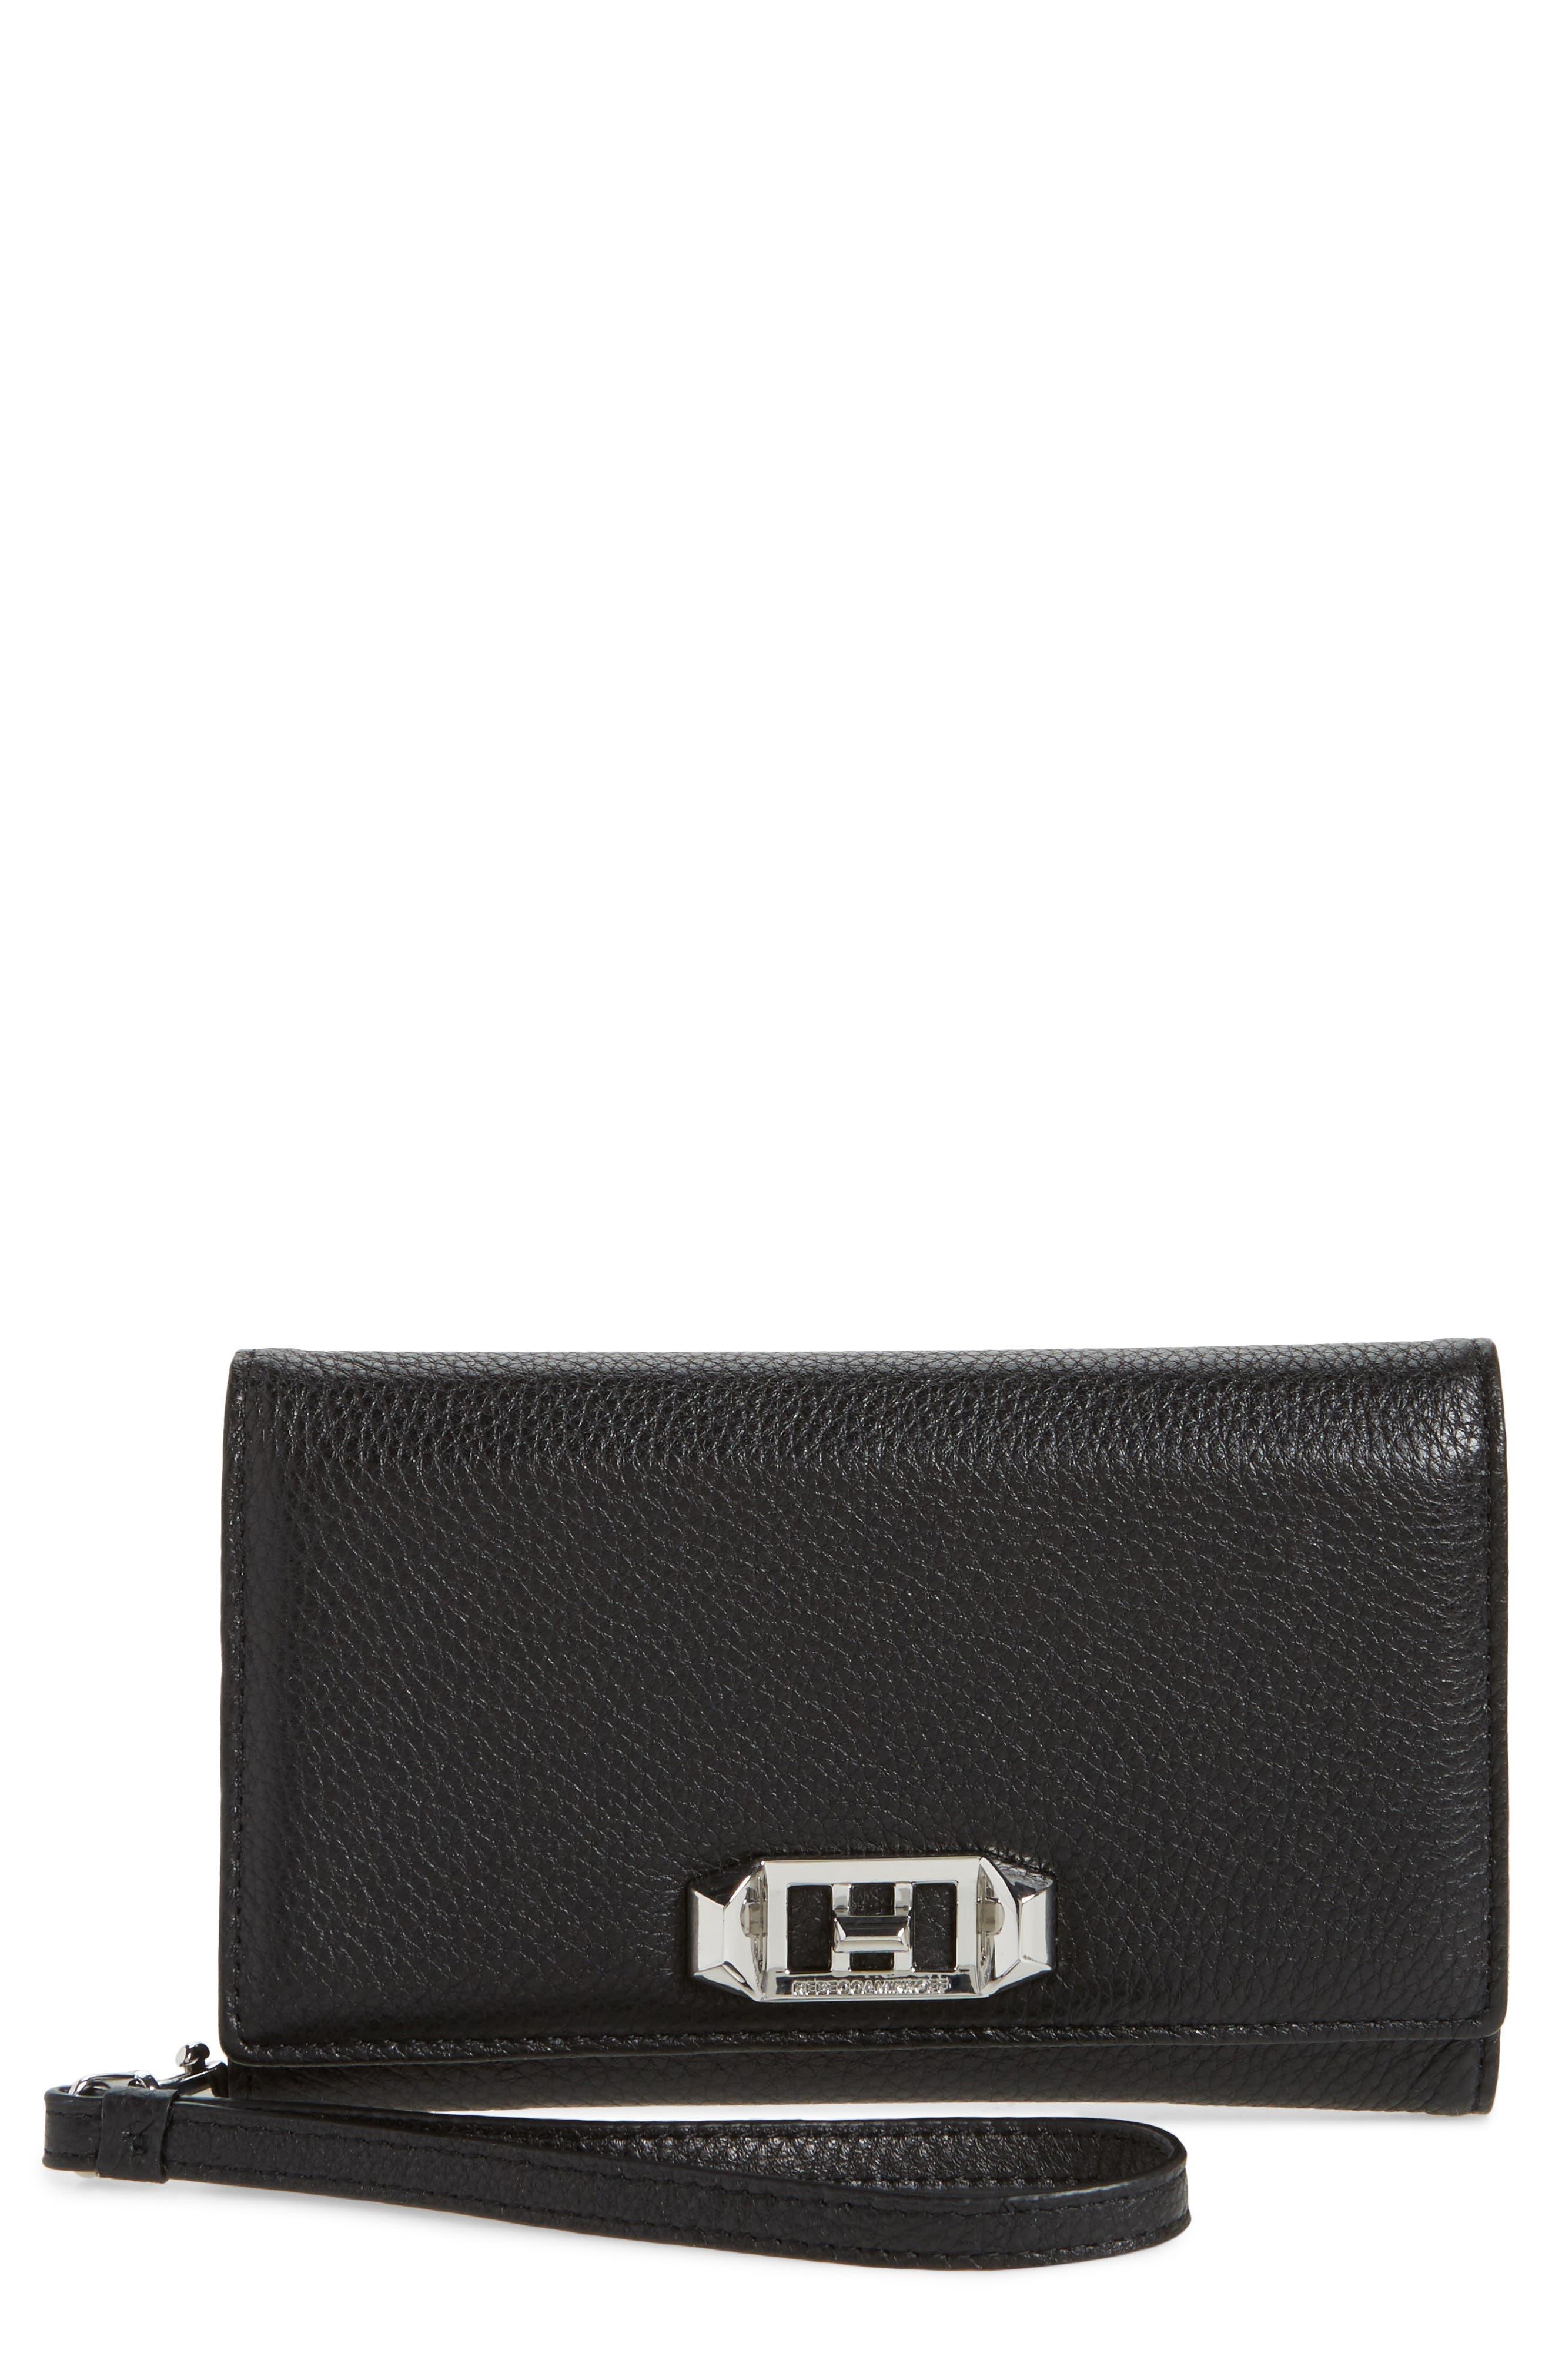 REBECCA MINKOFF Love Lock iPhone 7/8 & 7/8 Plus Leather Wristlet Folio, Main, color, 001